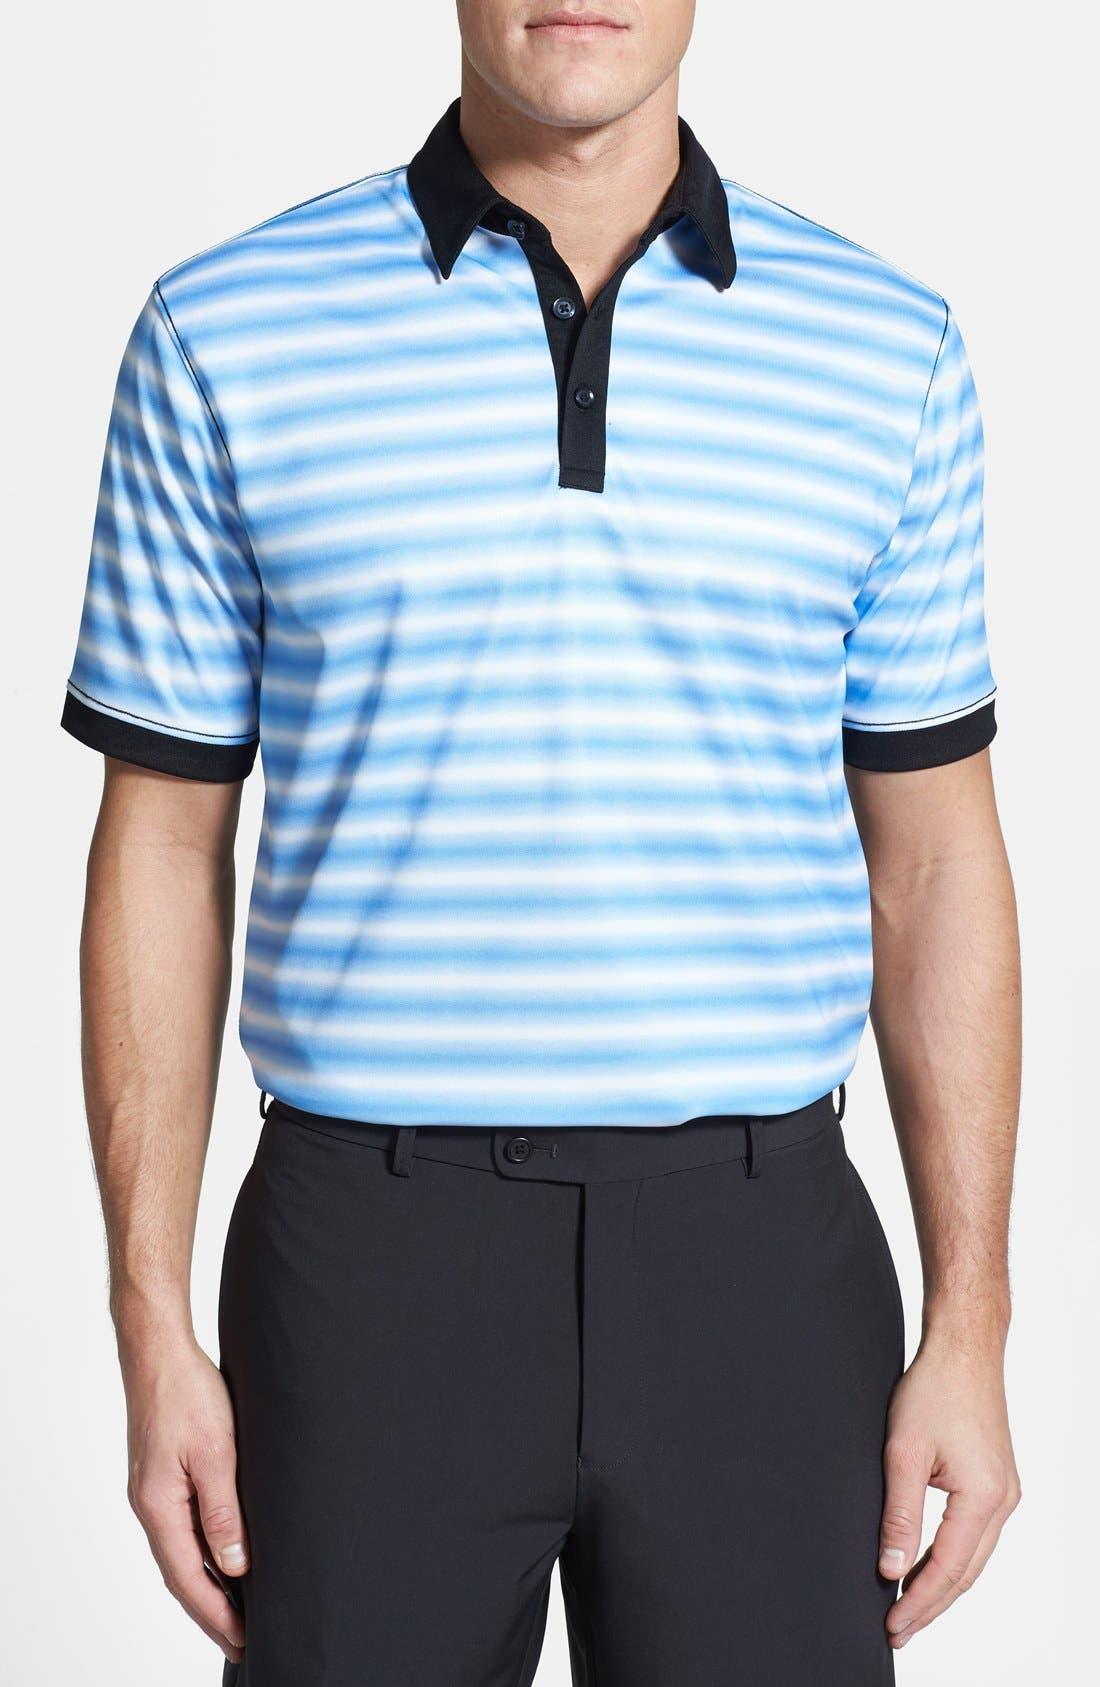 Alternate Image 1 Selected - Callaway Golf® 'Bolt' Opti-Dri Moisture Wicking Polo